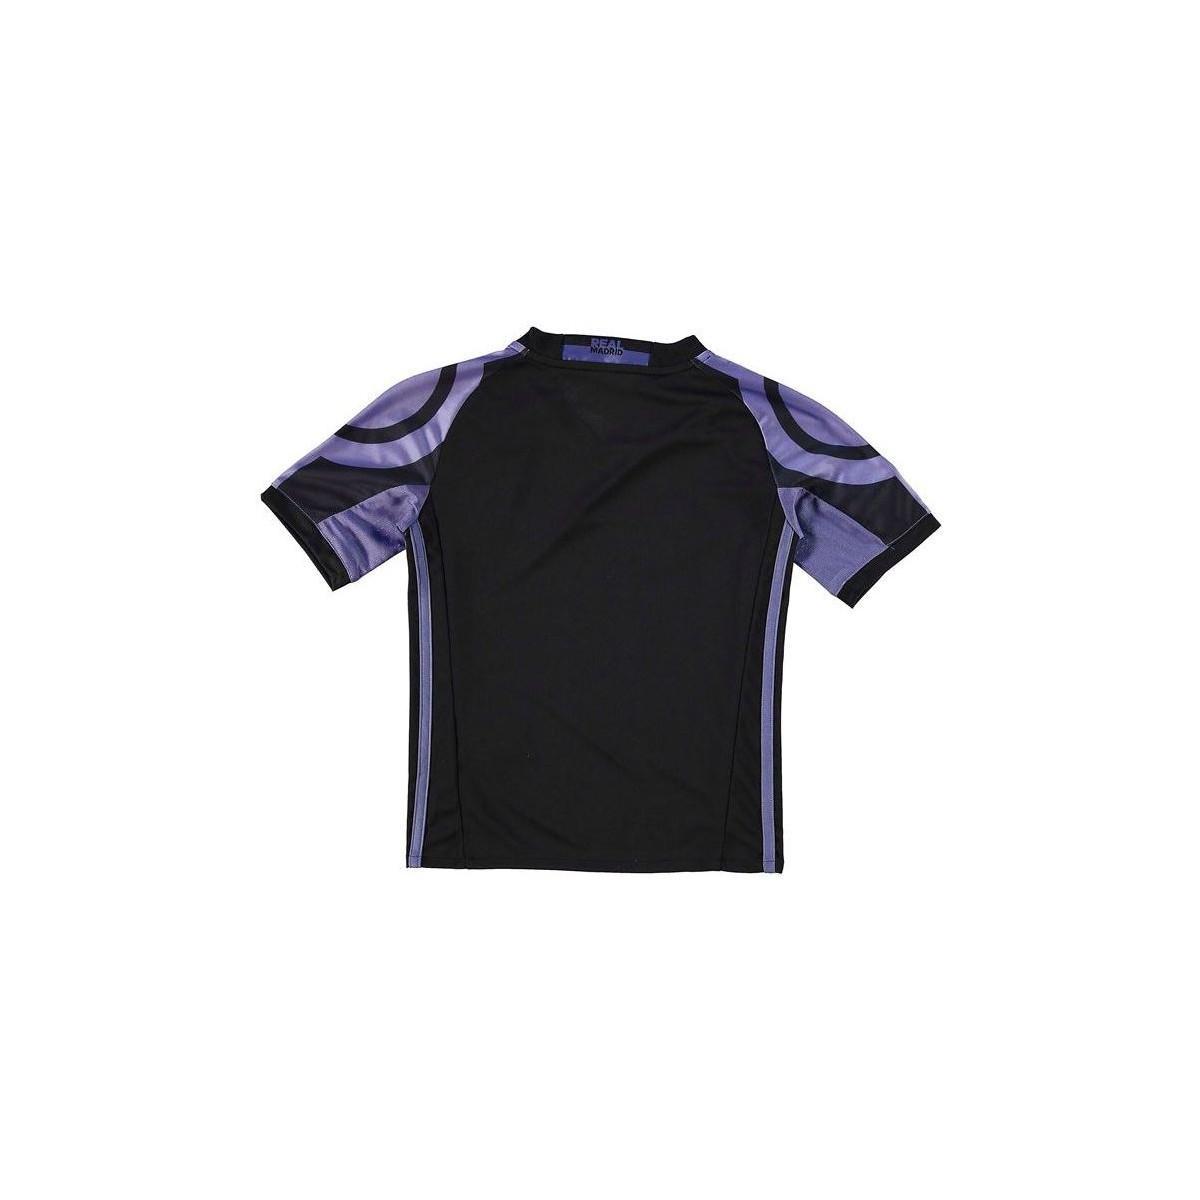 b6d862370fa Adidas 2016-17 Real Madrid 3rd Shirt (modric 19) - Kids Women s T ...